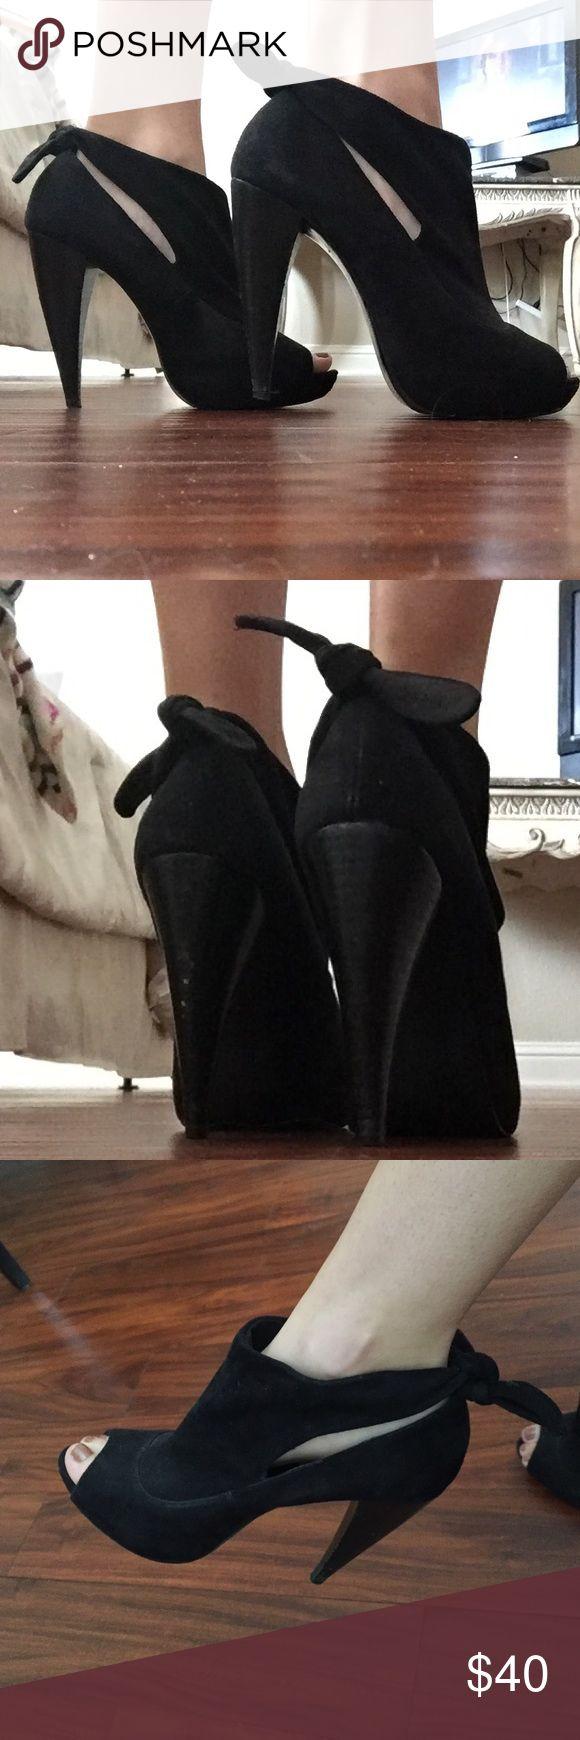 Steve Madden heels Black heels that tie at the back Steve Madden Shoes Heels